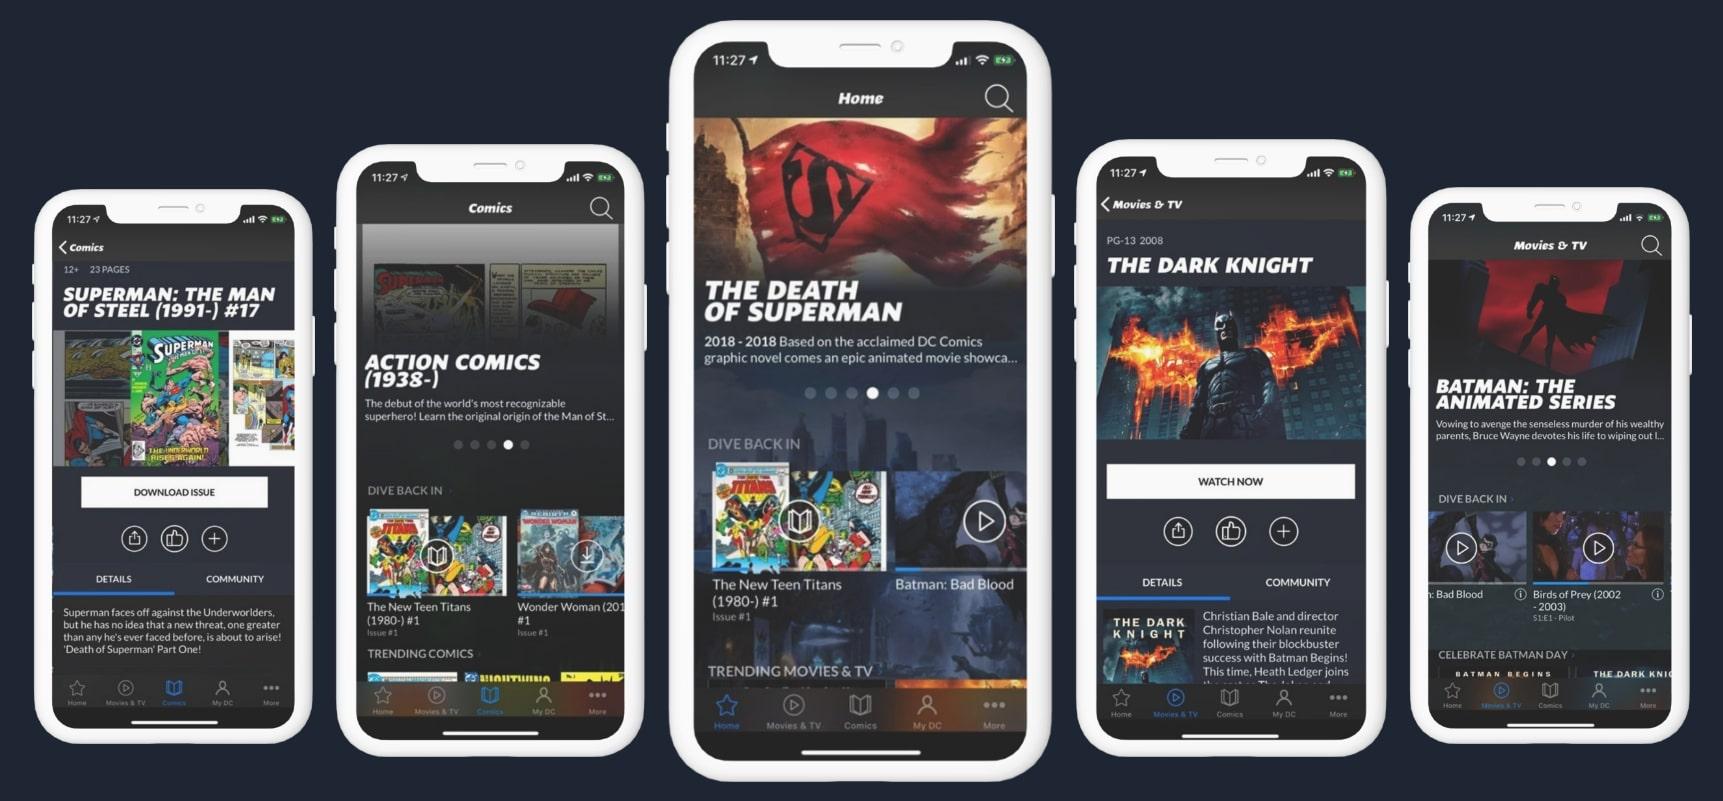 Screenshots of Comic Apps like DC Universe